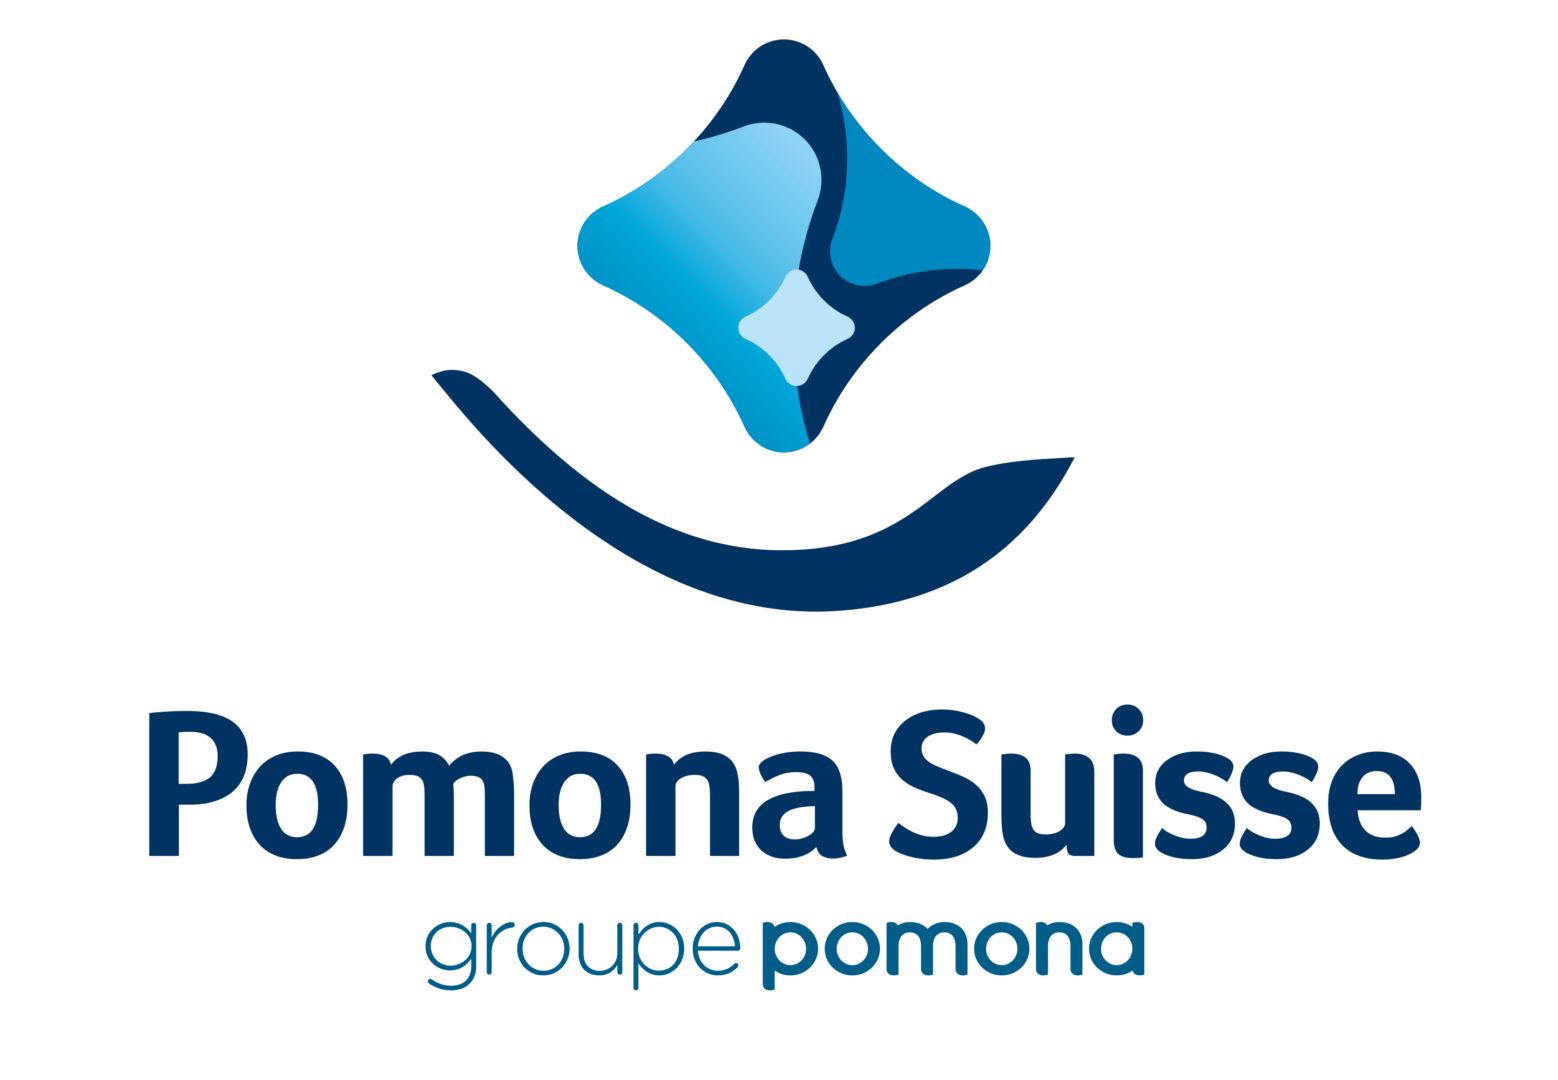 Pomona Suisse